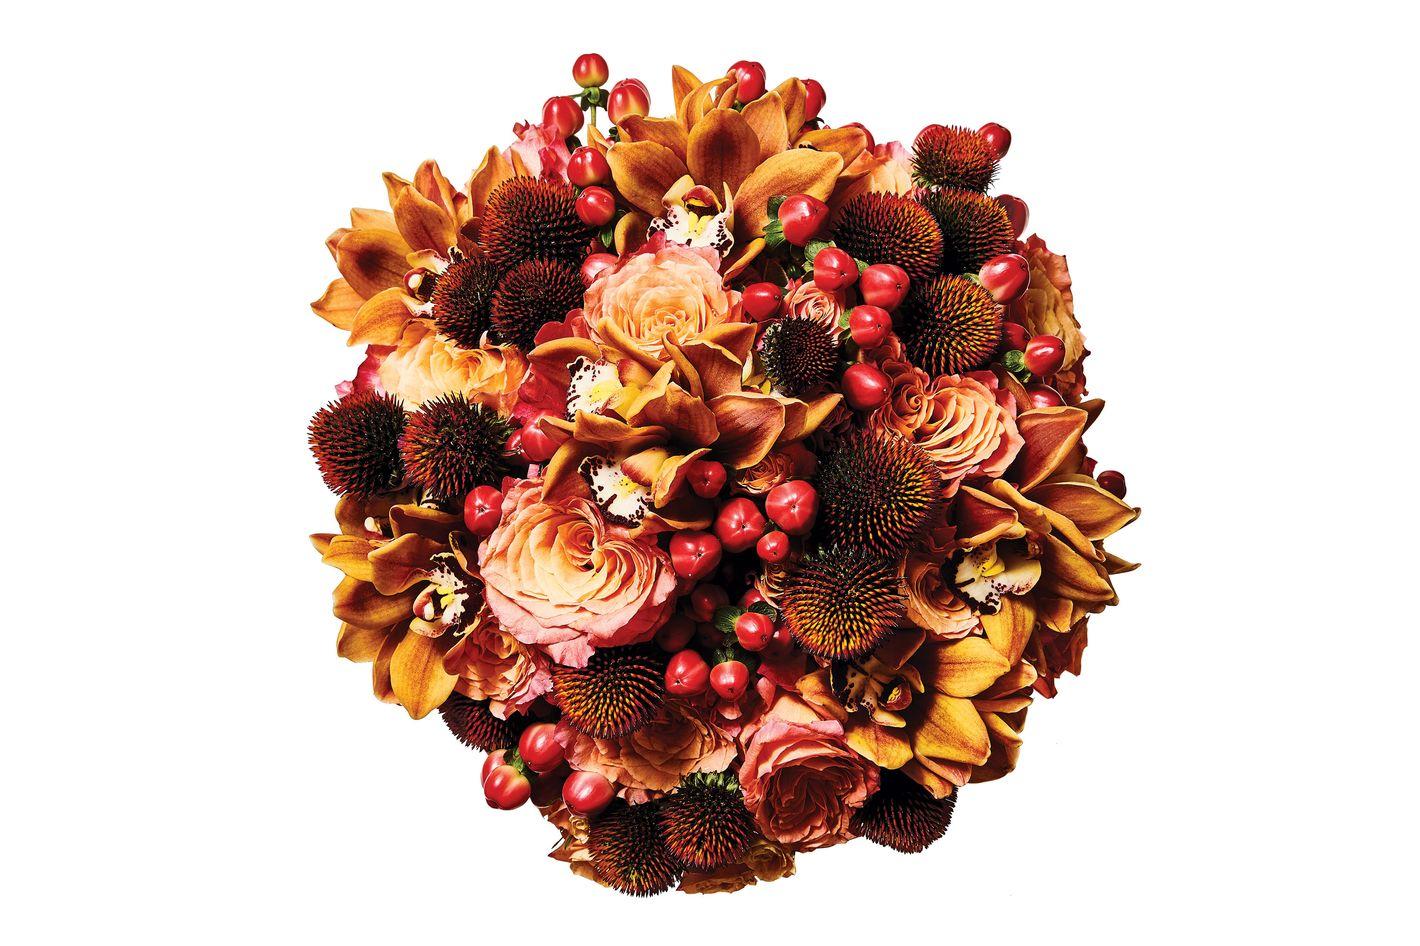 Free Spirit rose, mini orange cymbidium orchid, rudbeckia, and red hypericum berry